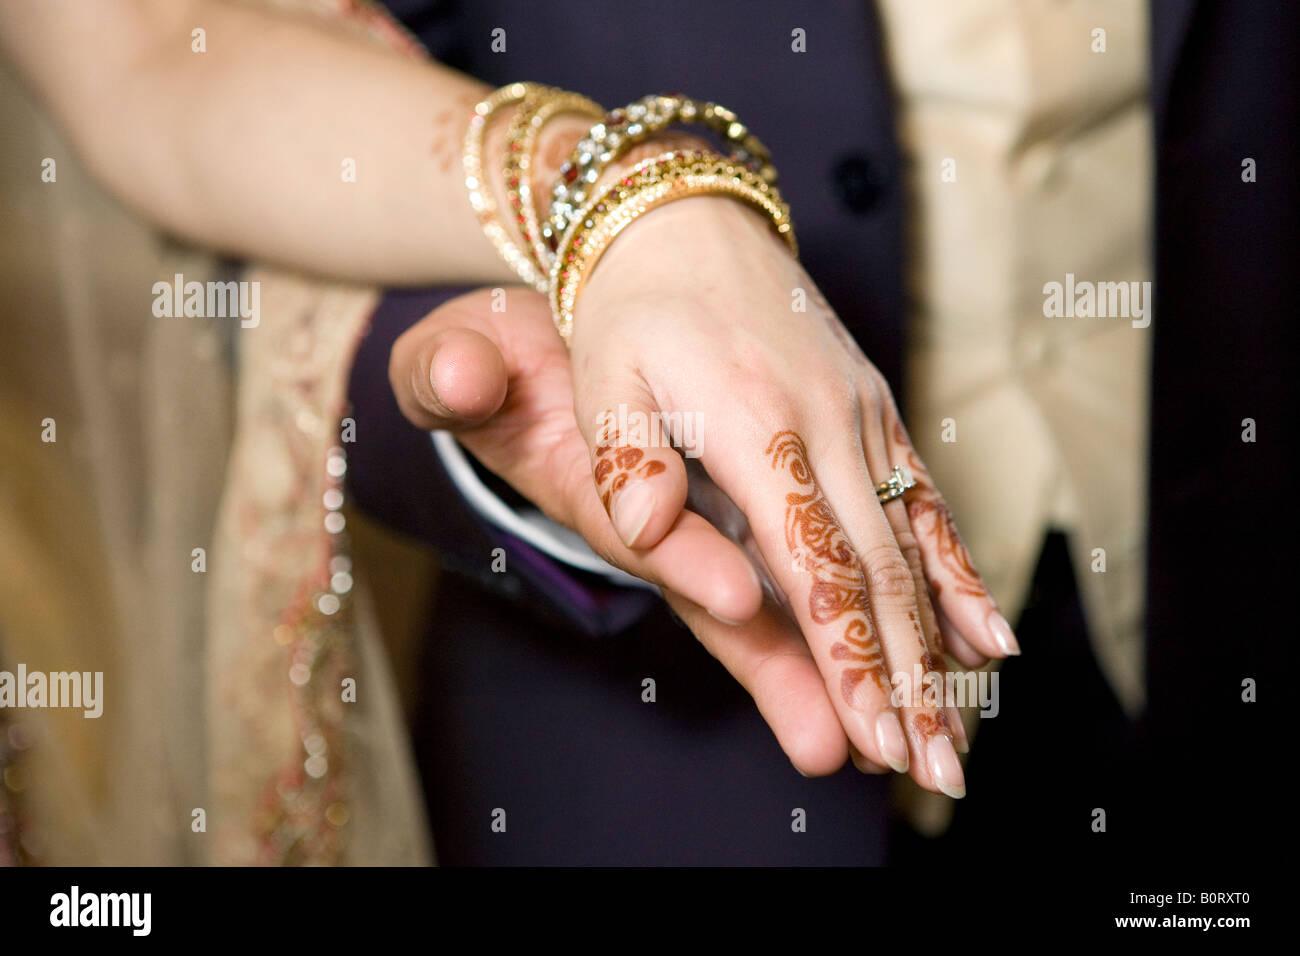 c027615e0b339 Indian wedding - holding hands with henna bridal mehndi Stock Photo ...